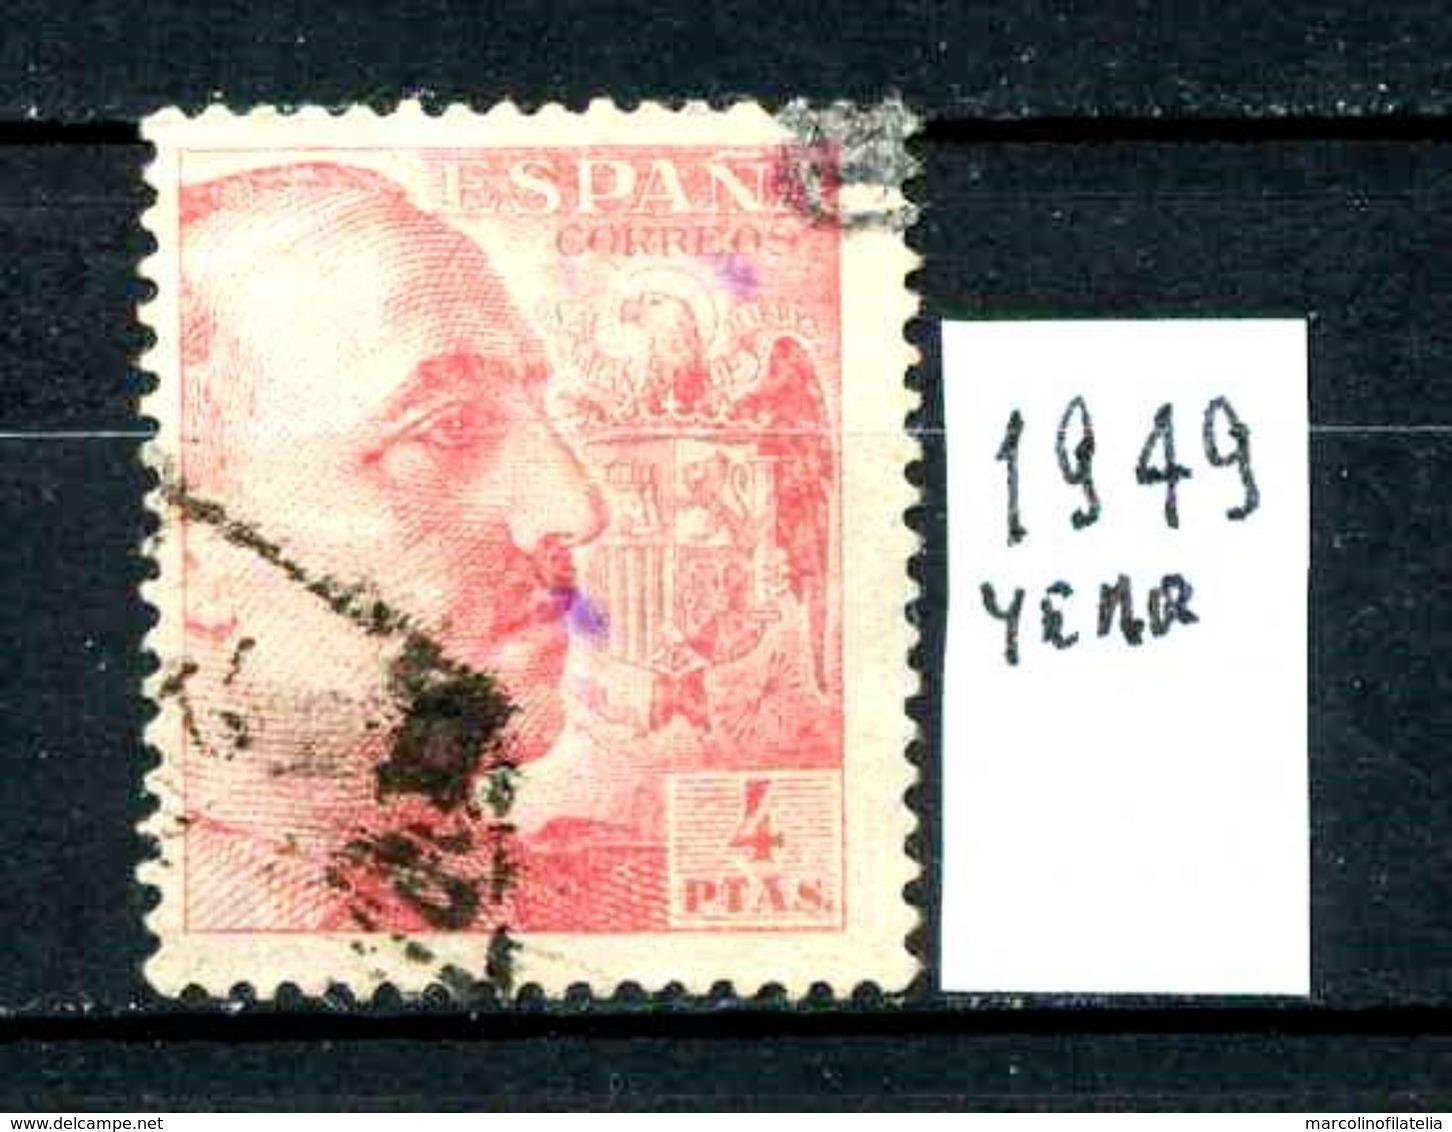 SPAGNA - Generale FRANCO - Year 1949 - Usato - Used - Utilisè -gebraucht. - 1931-50 Usati